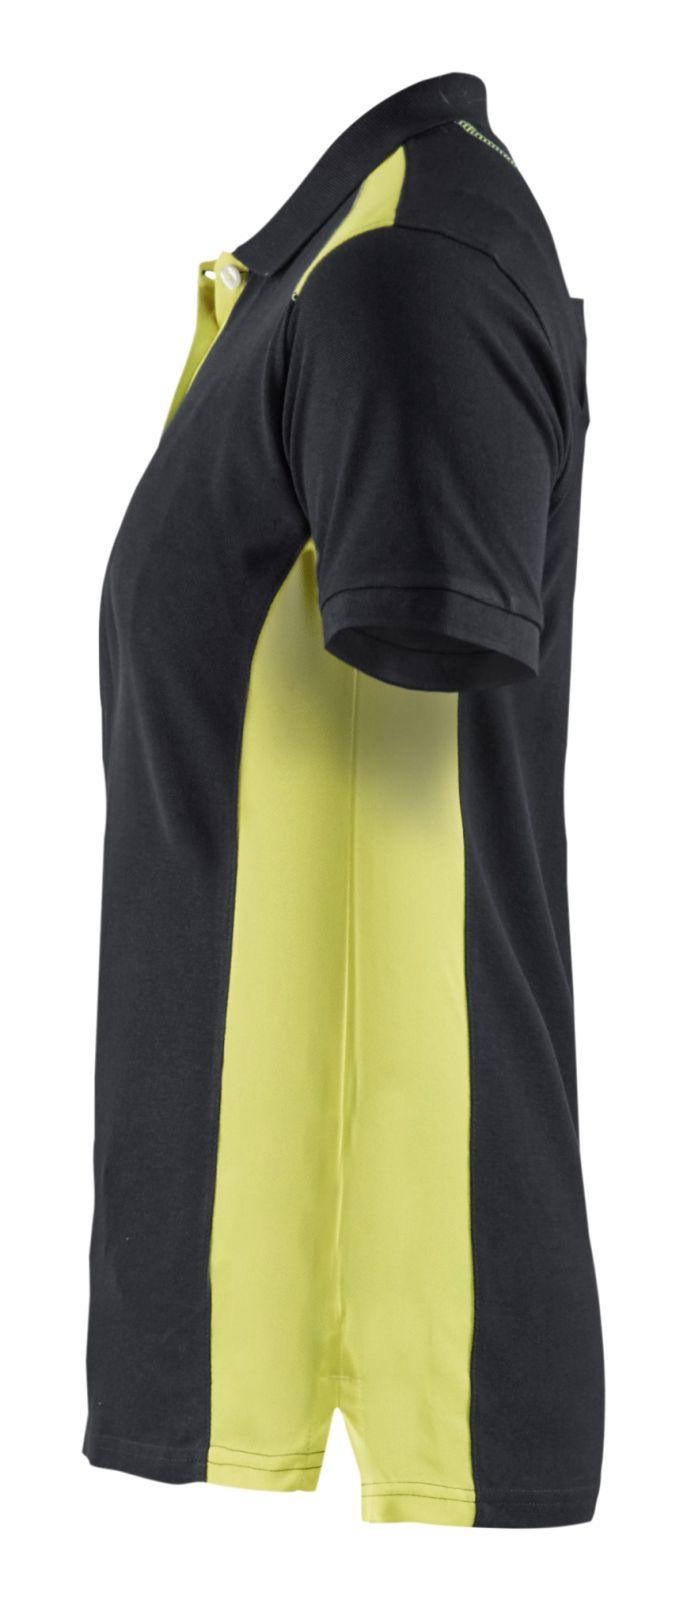 Blaklader Dames polo shirts 33901050 zwart-geel(9933)